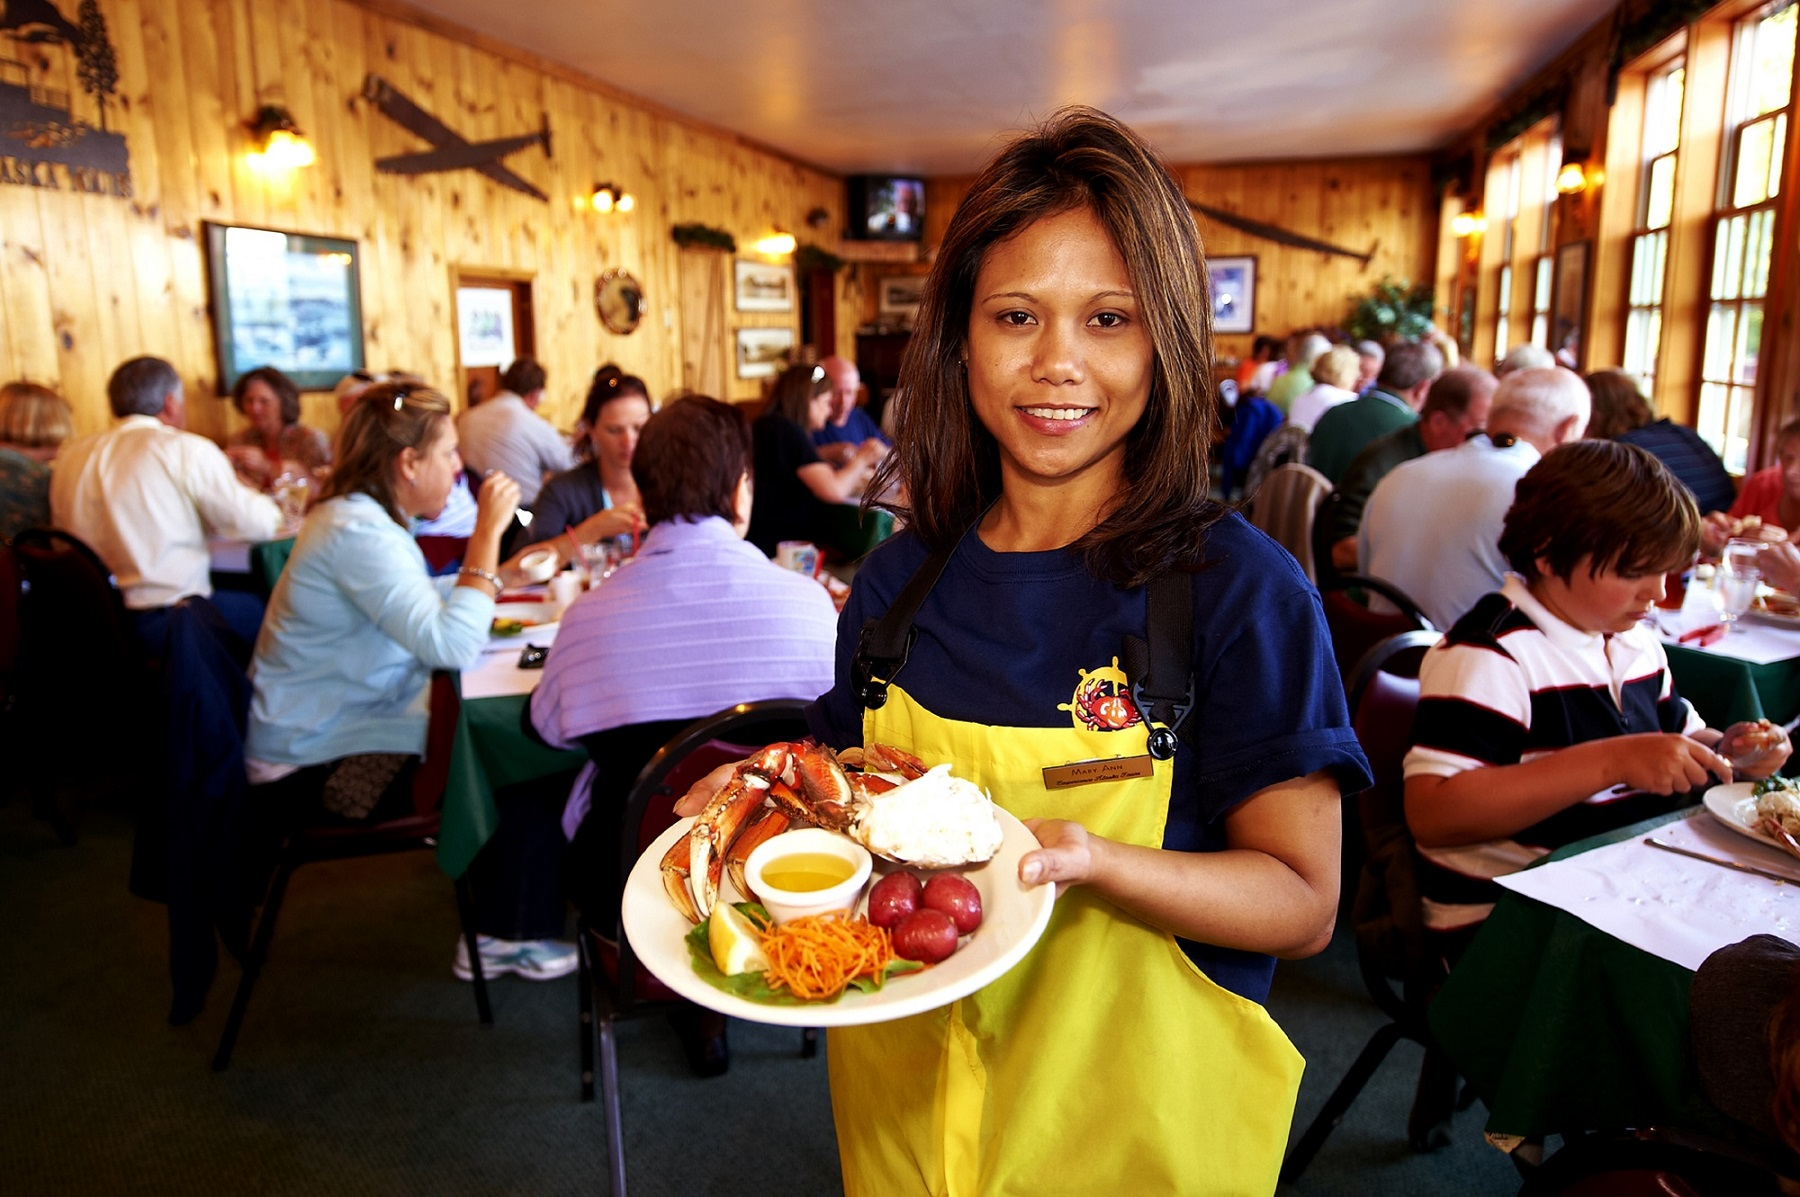 https://www.kawanti.com/wp-content/uploads/2020/02/Crab-Feast-Ready-to-Eat.jpg